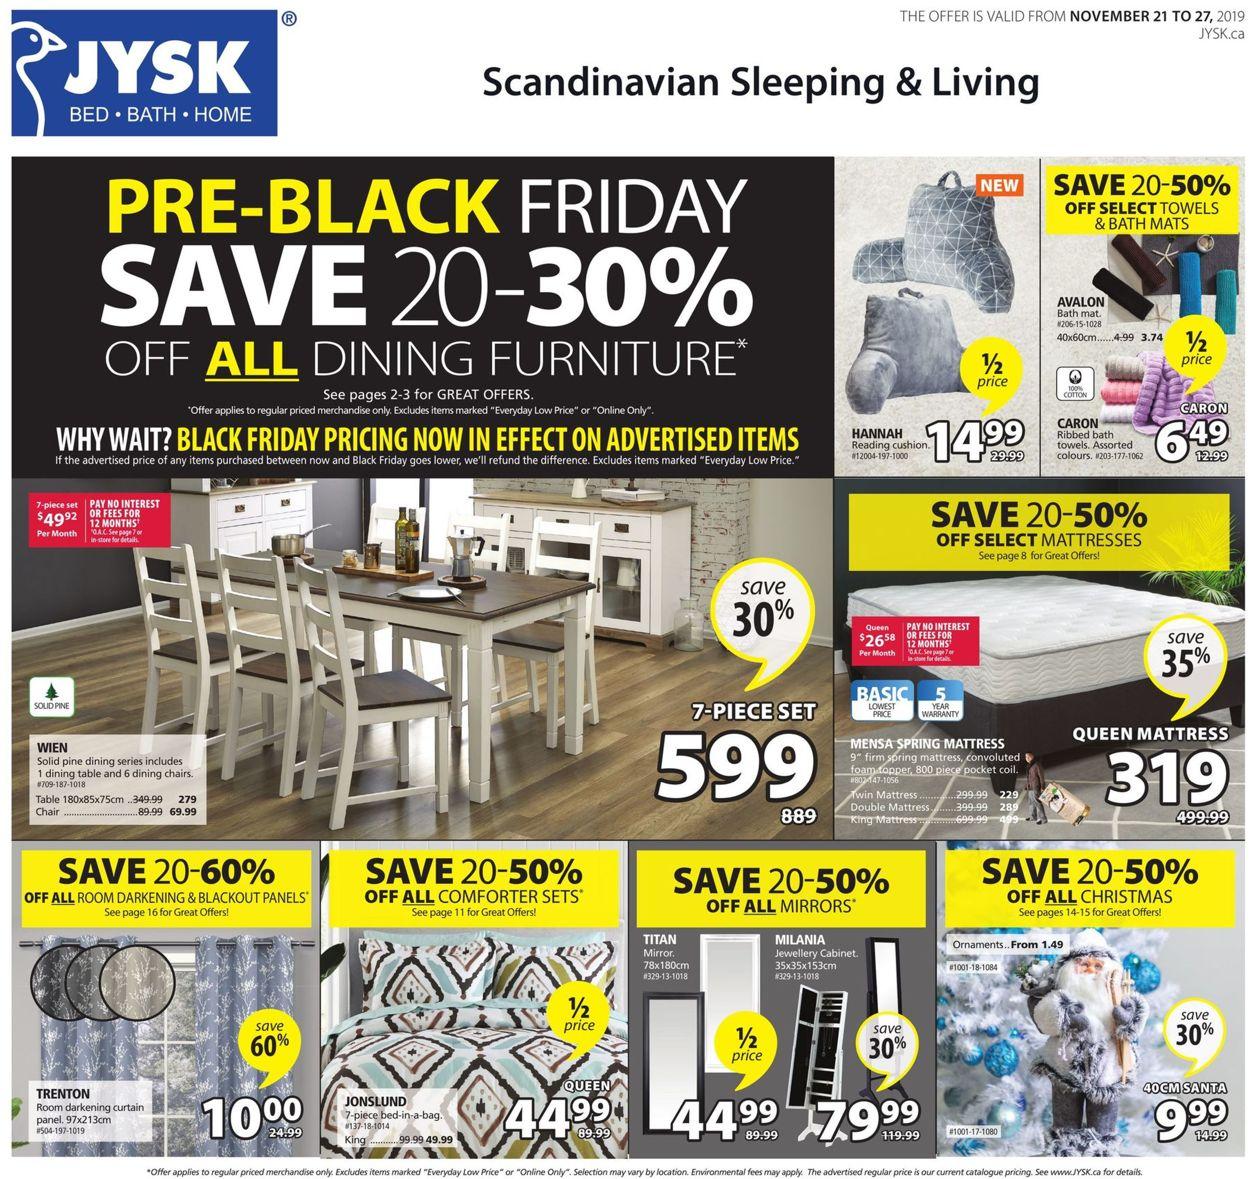 JYSK PRE-BLACK FRIDAY SALE!